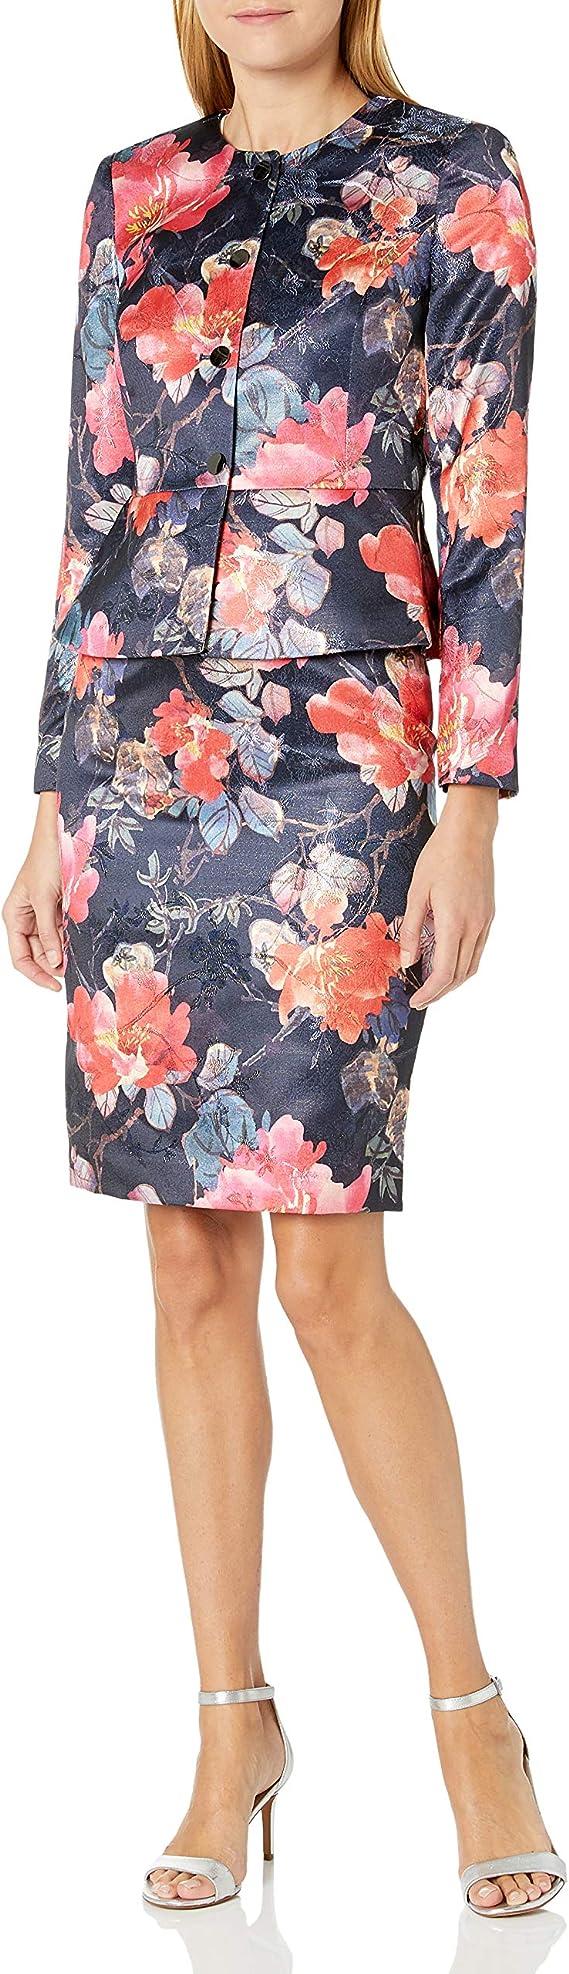 T Tahari Womens Button Tab Knee-Length Business Wear A-Line Skirt BHFO 4053